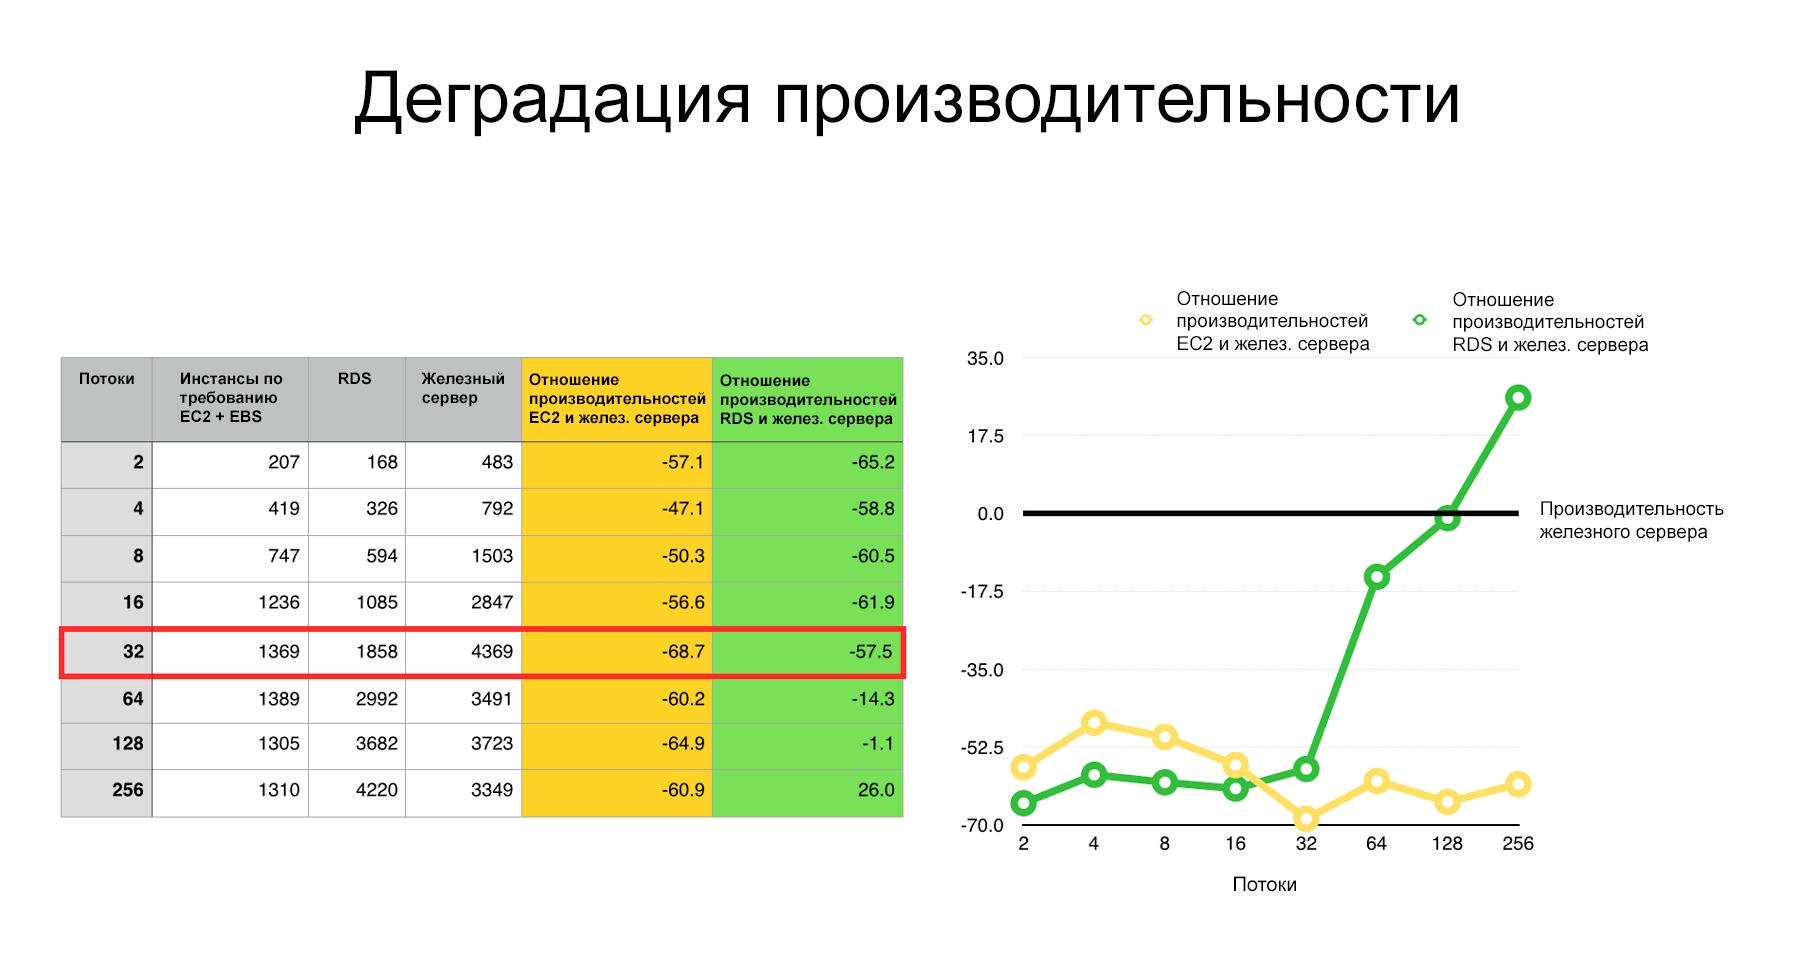 Сравнение производительности железного сервера и облака Amazon - 3